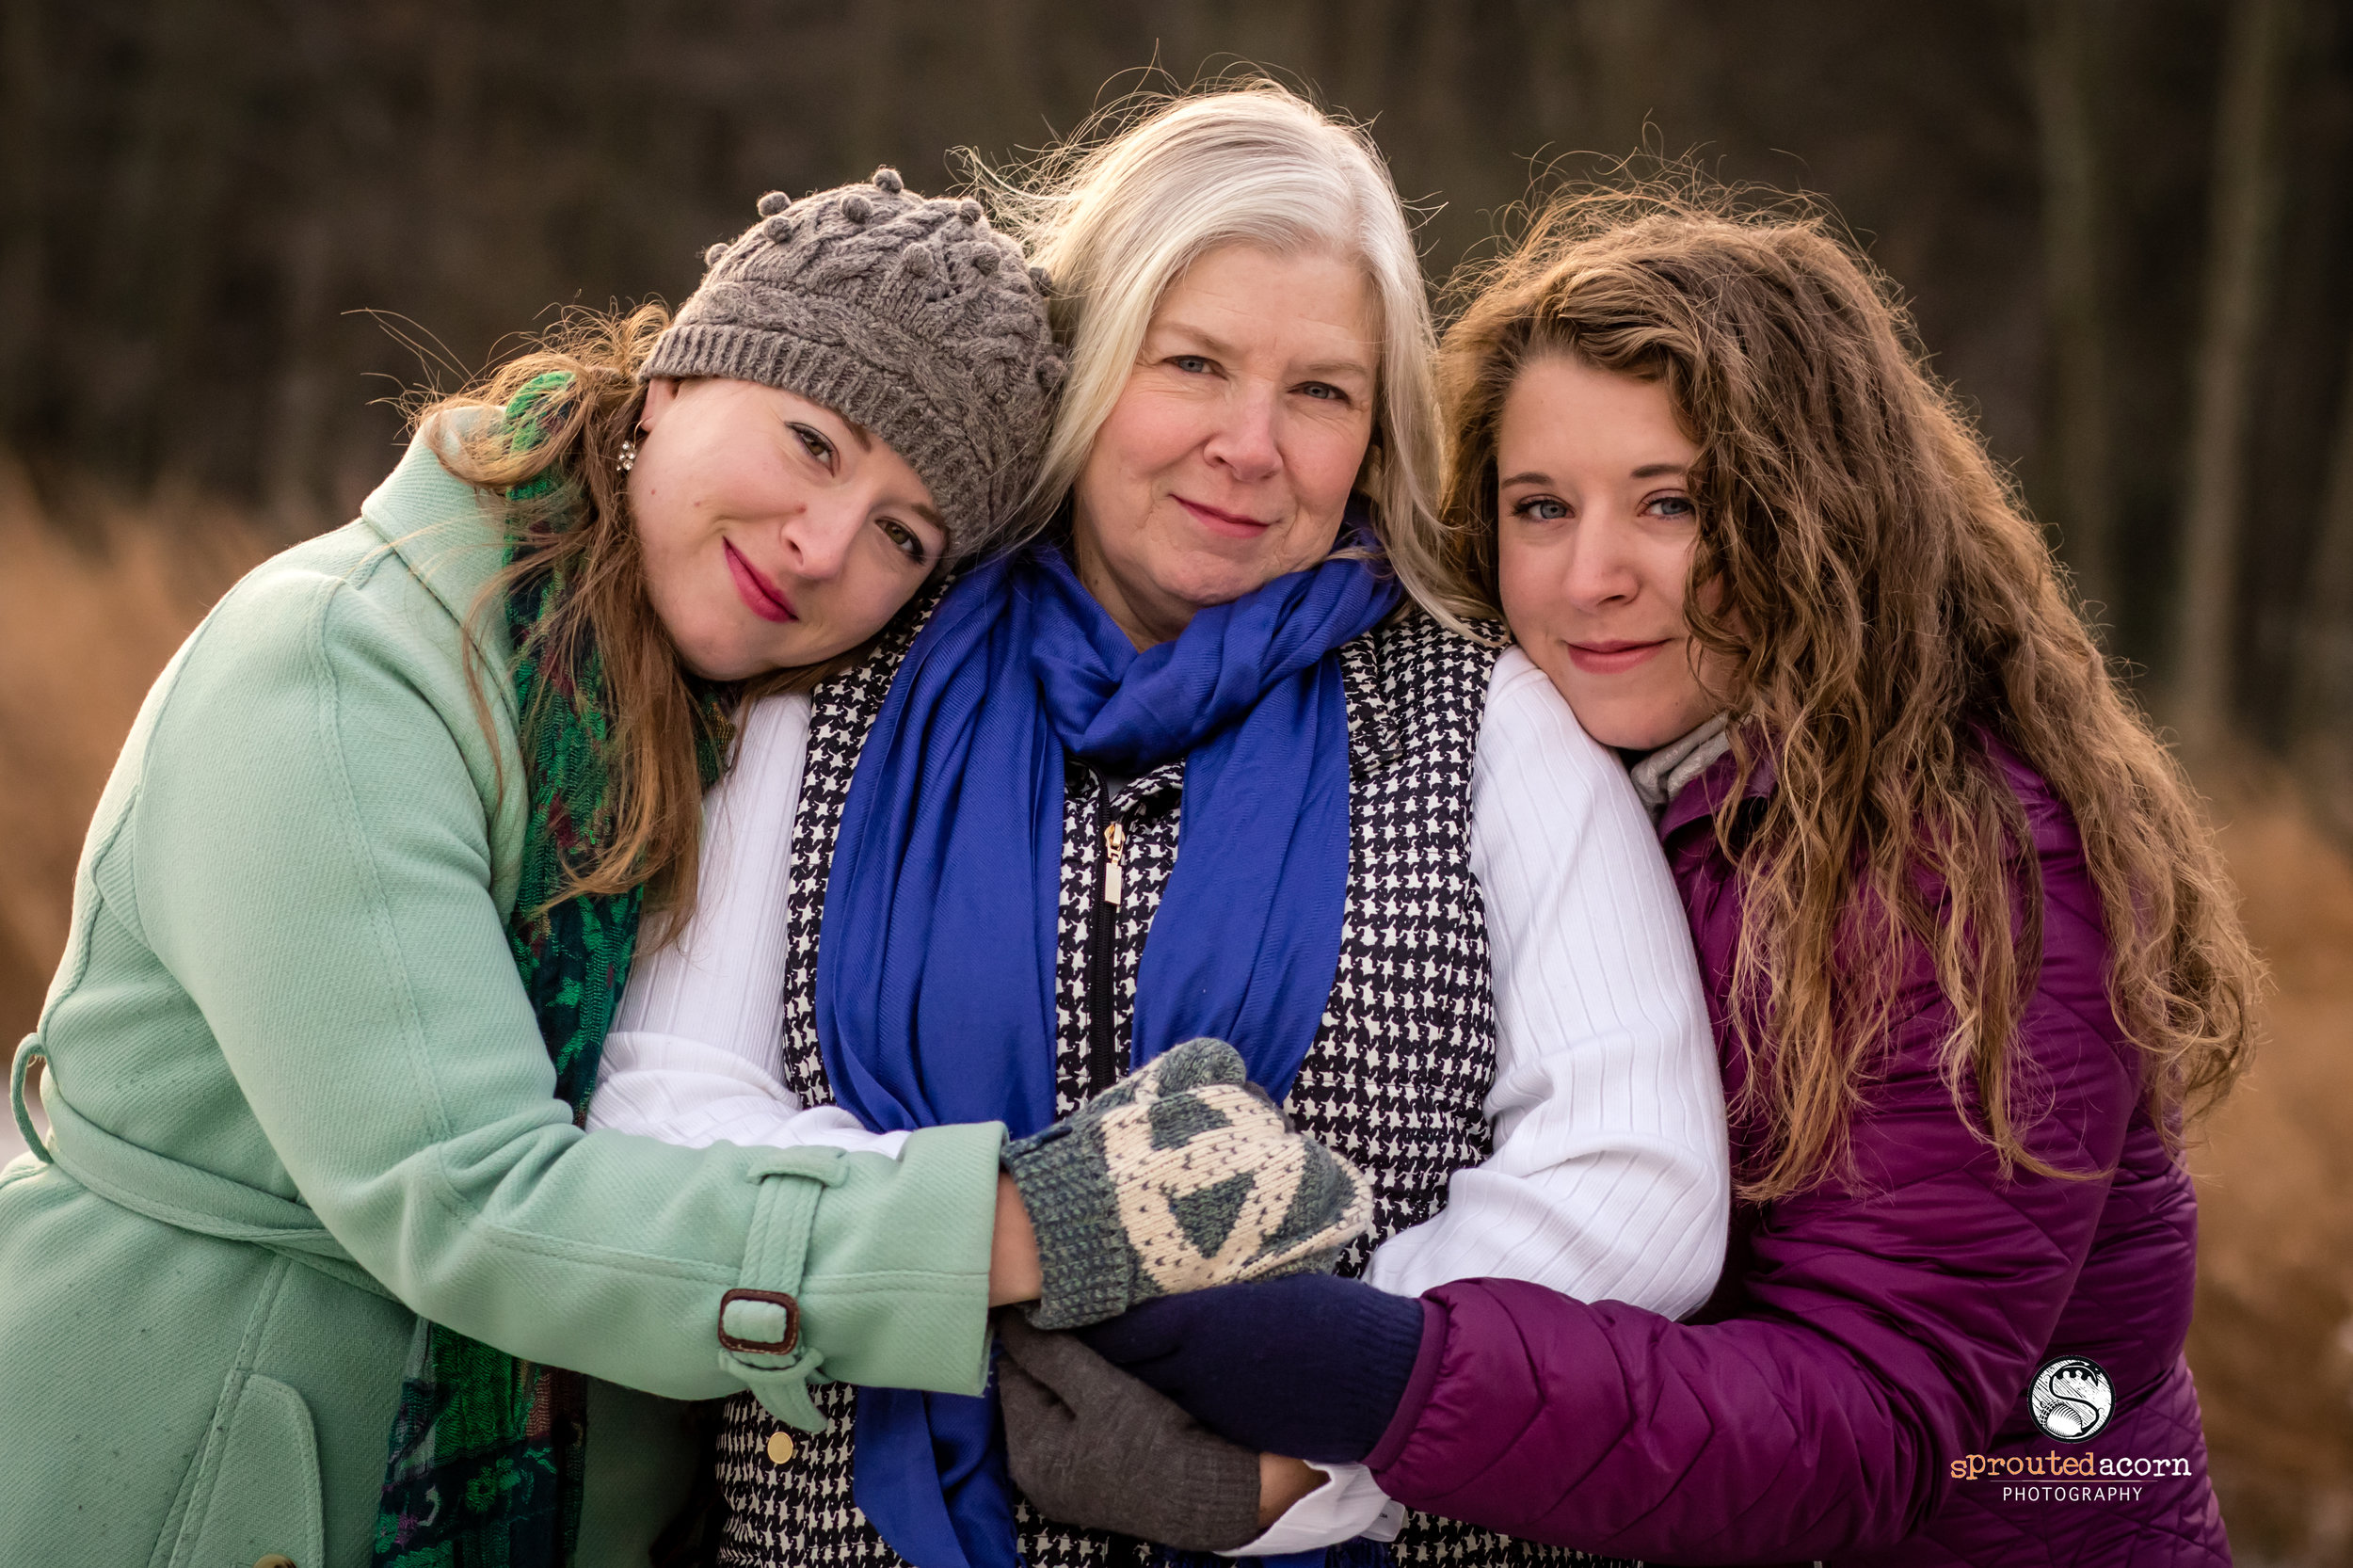 Geib Family Photos December 2017 Favorites WW (5 of 9).jpg